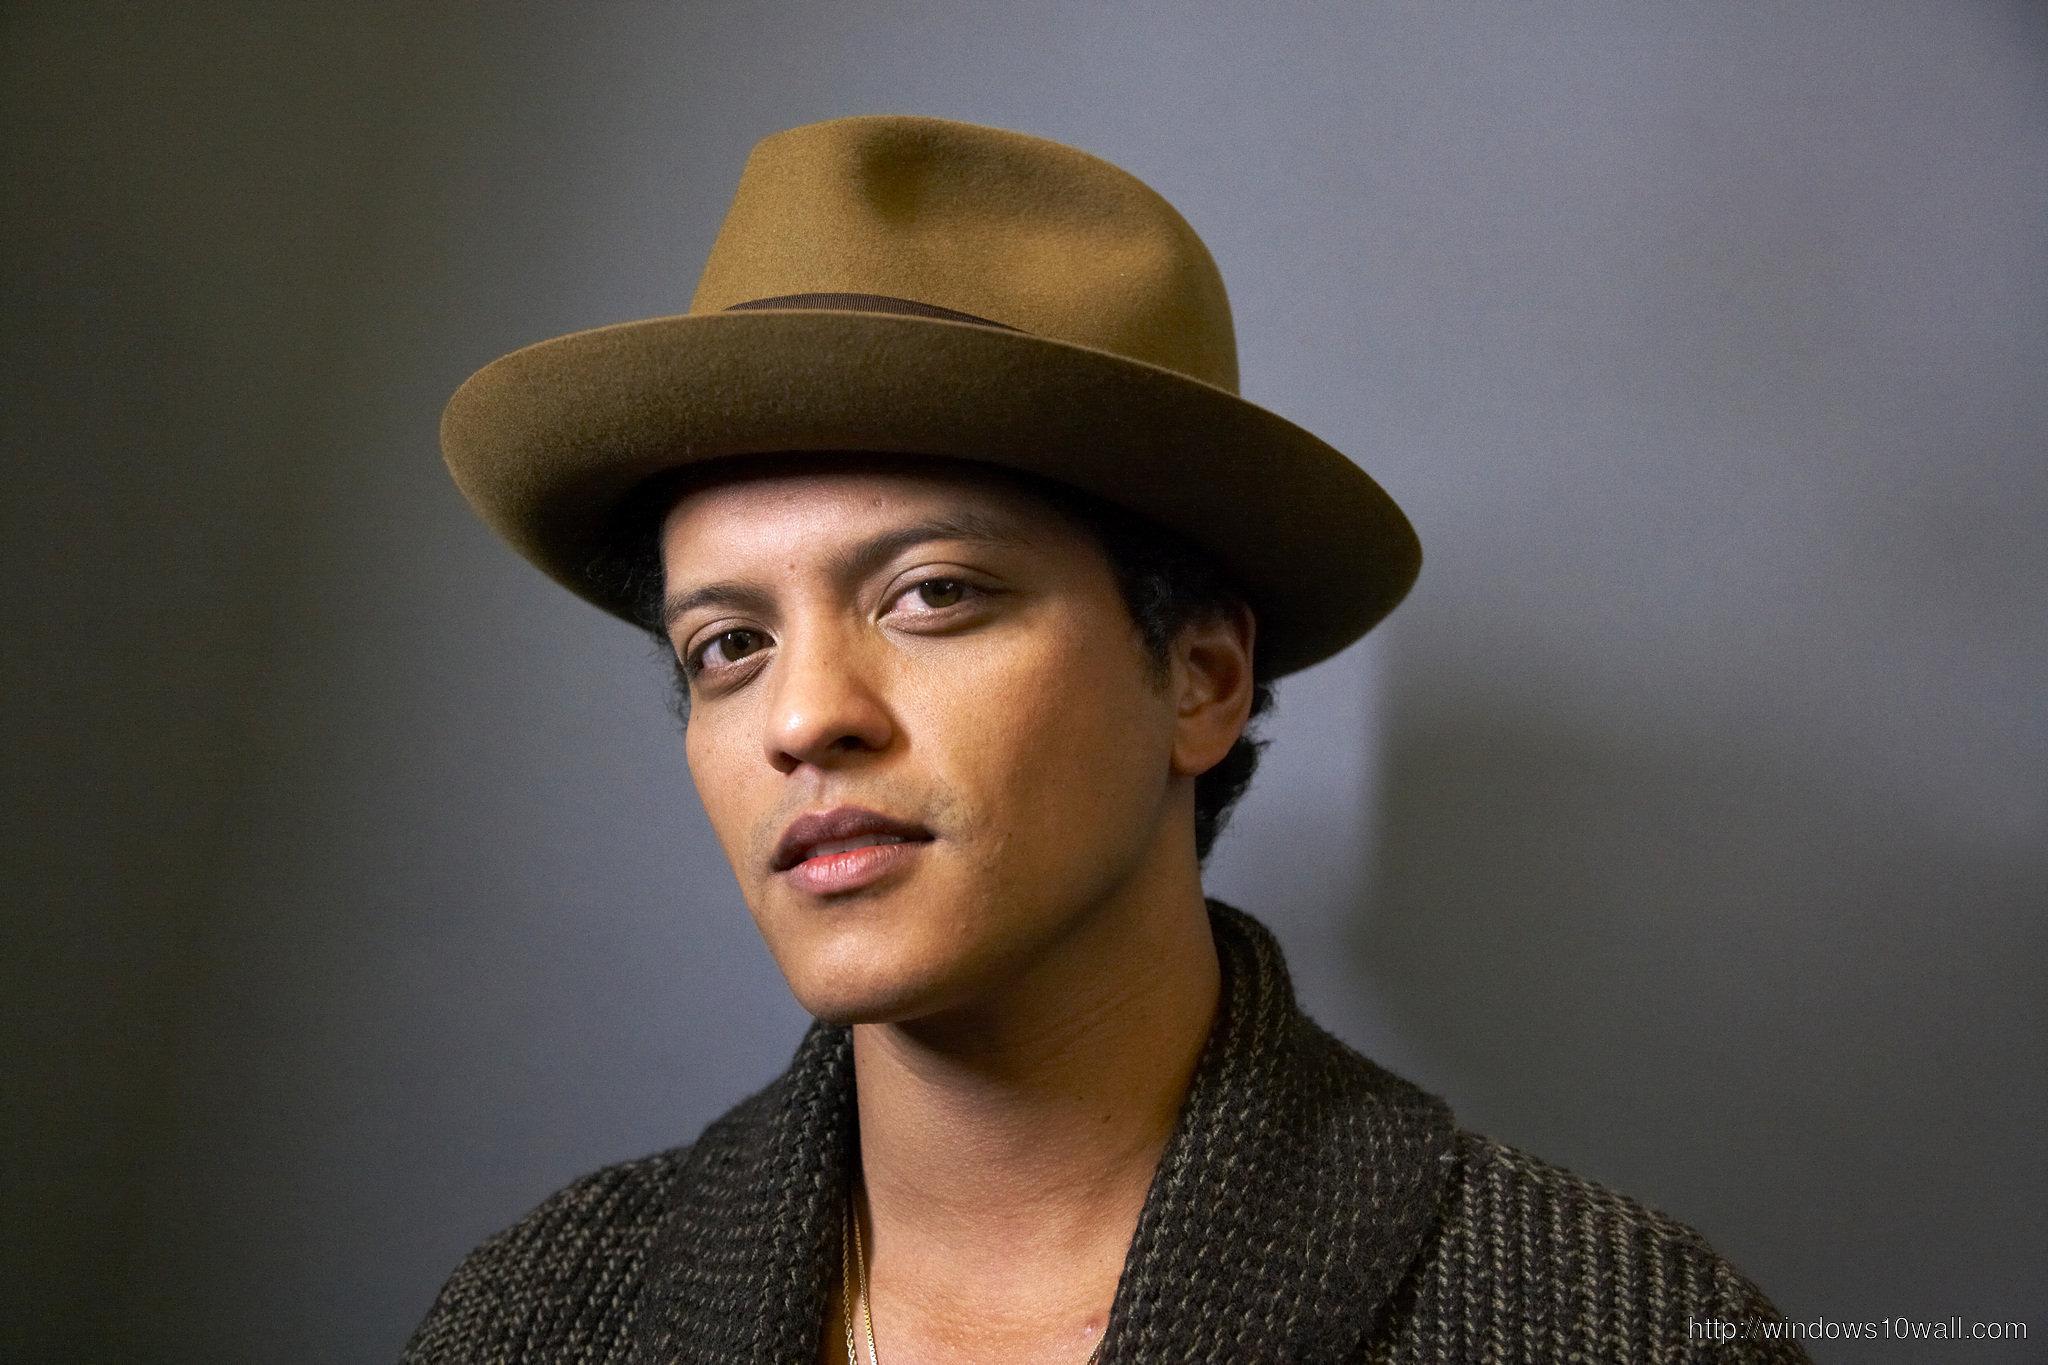 Bruno-Mars-Closer-Look-HD-Wallpaper